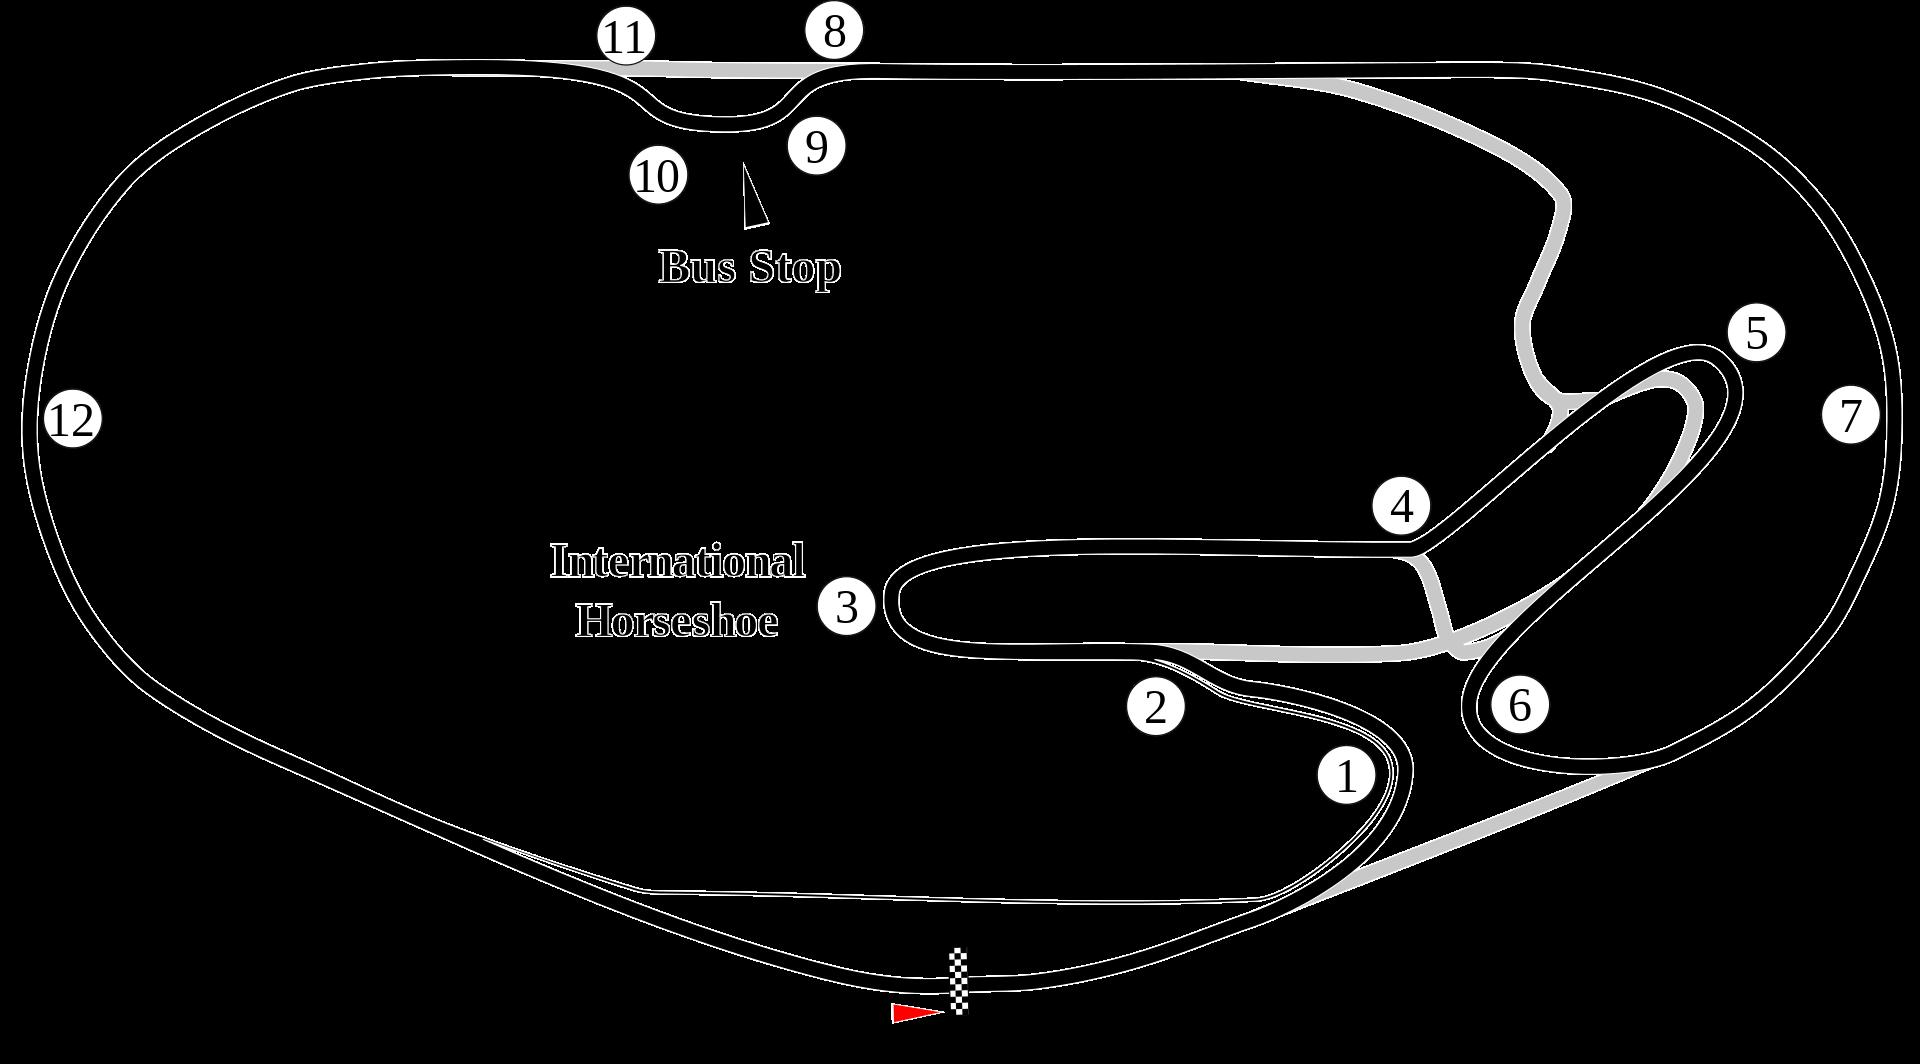 ferrari challenge racing track